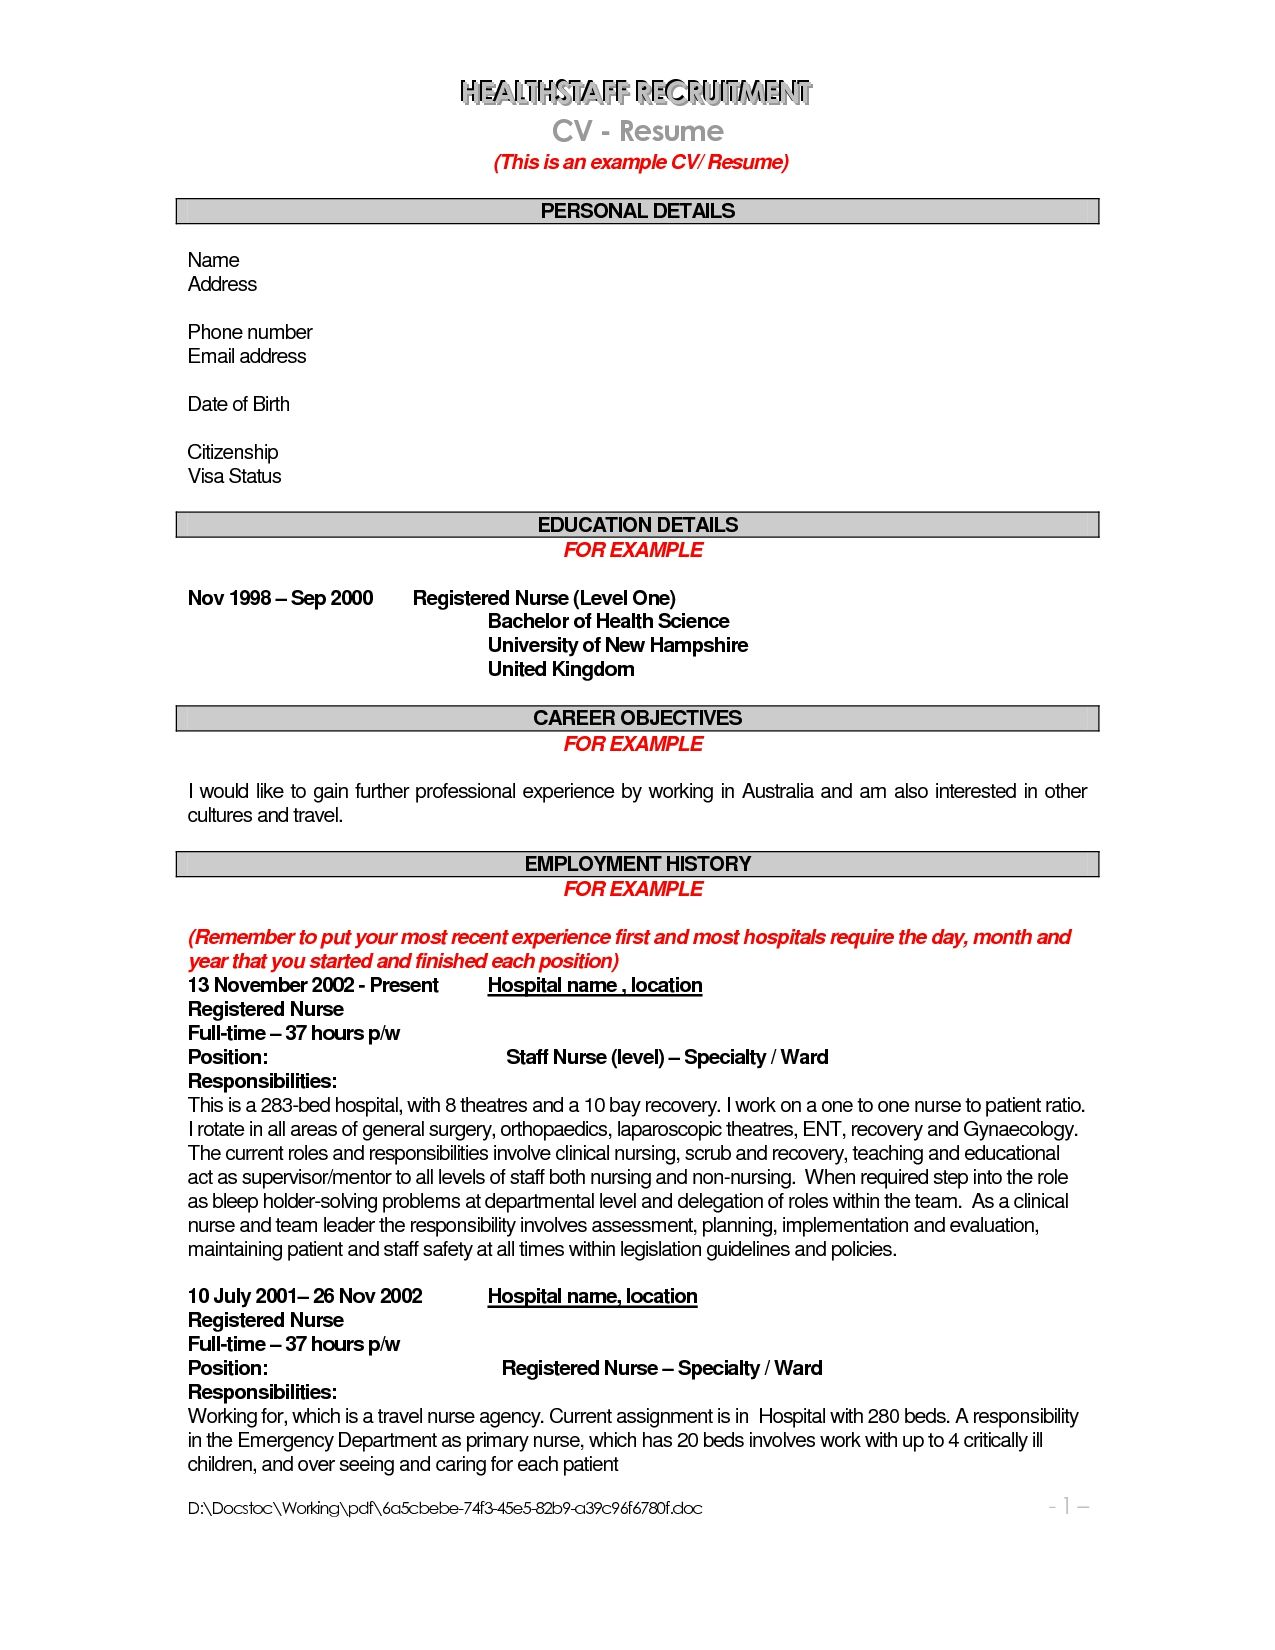 Resume Job Description Cover Letter Template Sample Resumes